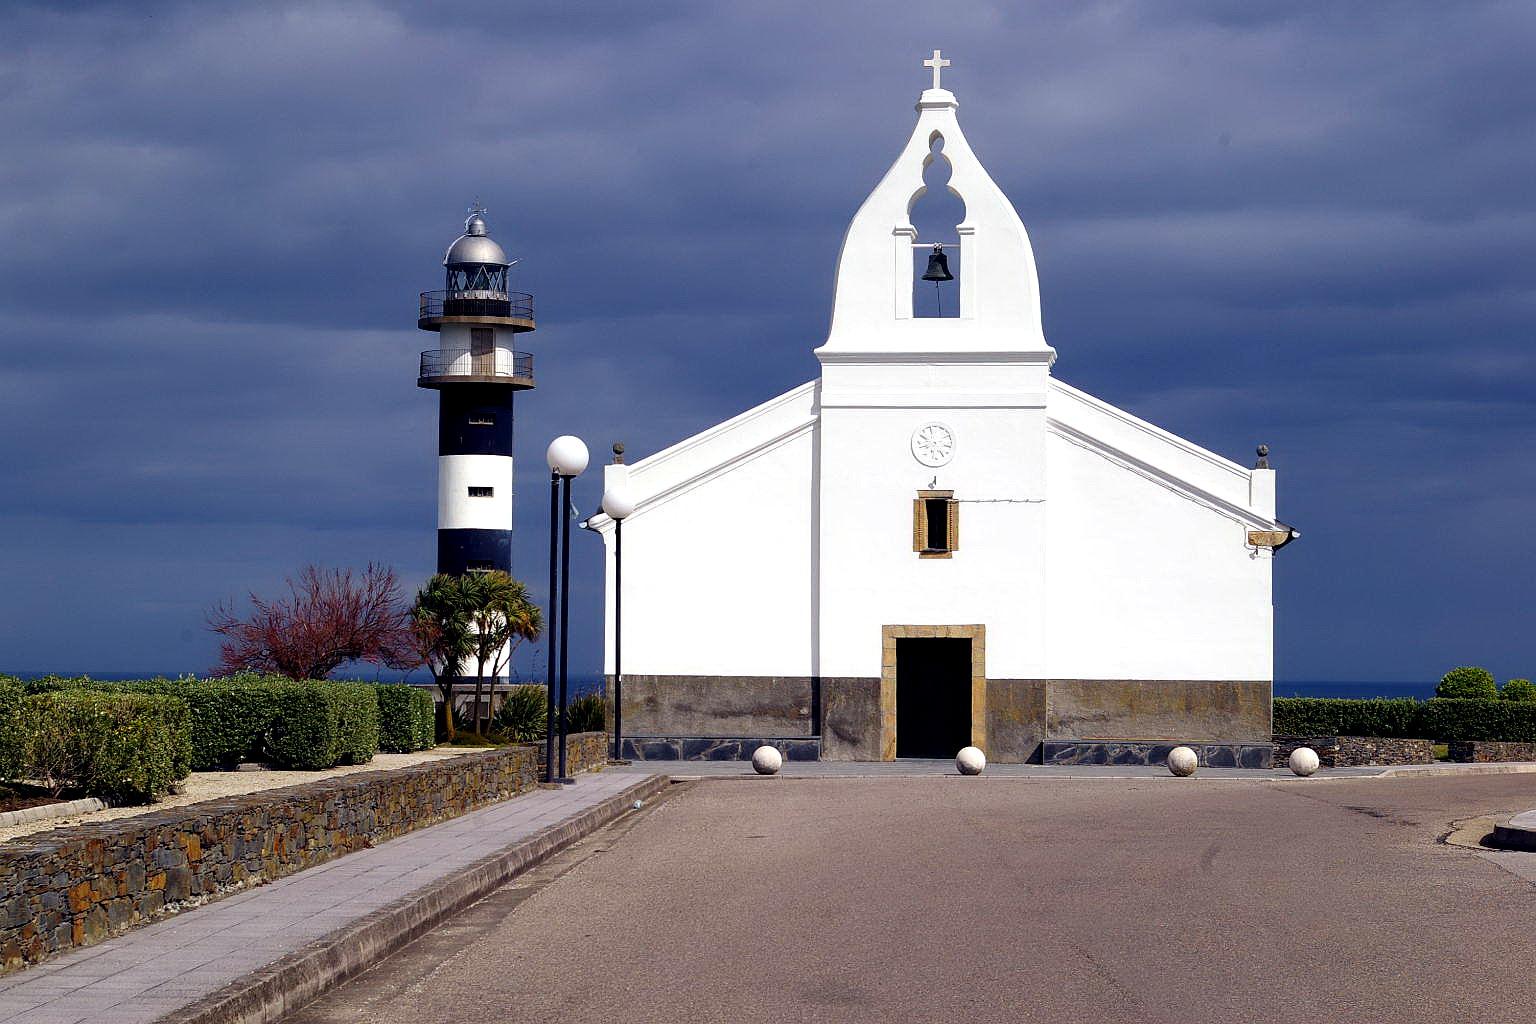 Foto playa Arnelles. Capilla y   Faro de San Agustin, Ortiguera, Coaña, Asturias